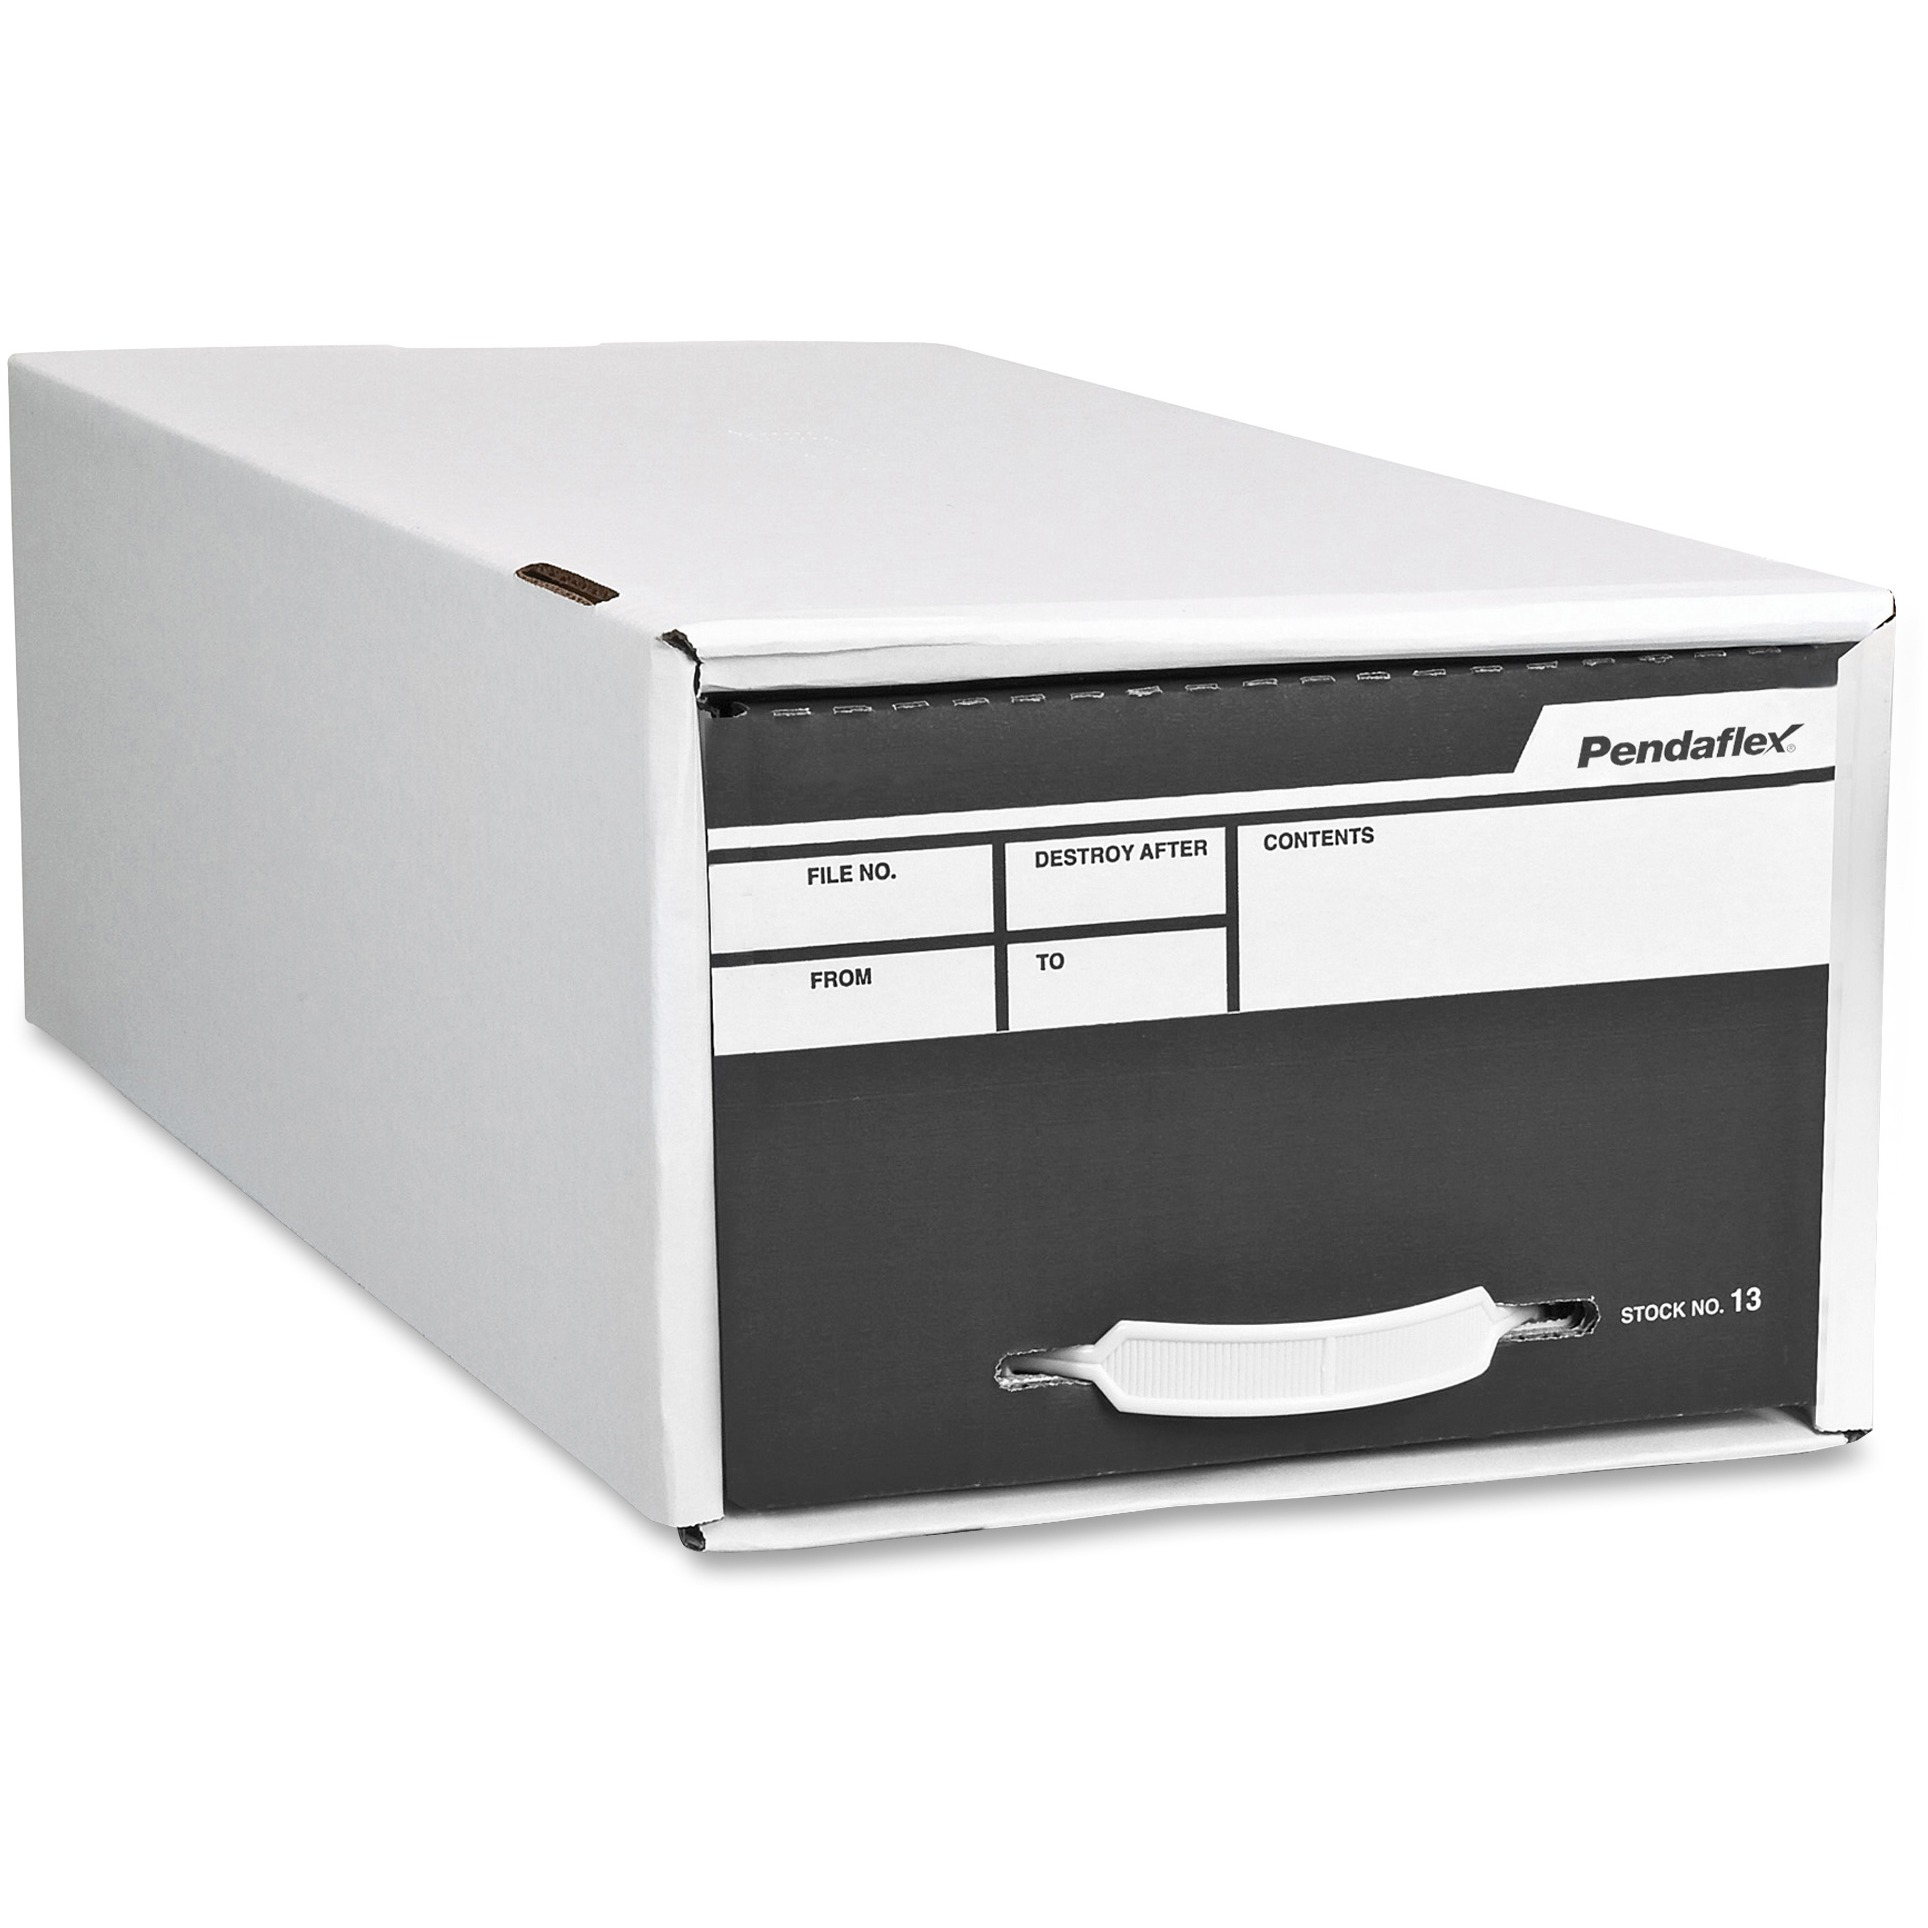 Pendaflex, PFX13, Standard Storage File Boxes, 1 Each, White